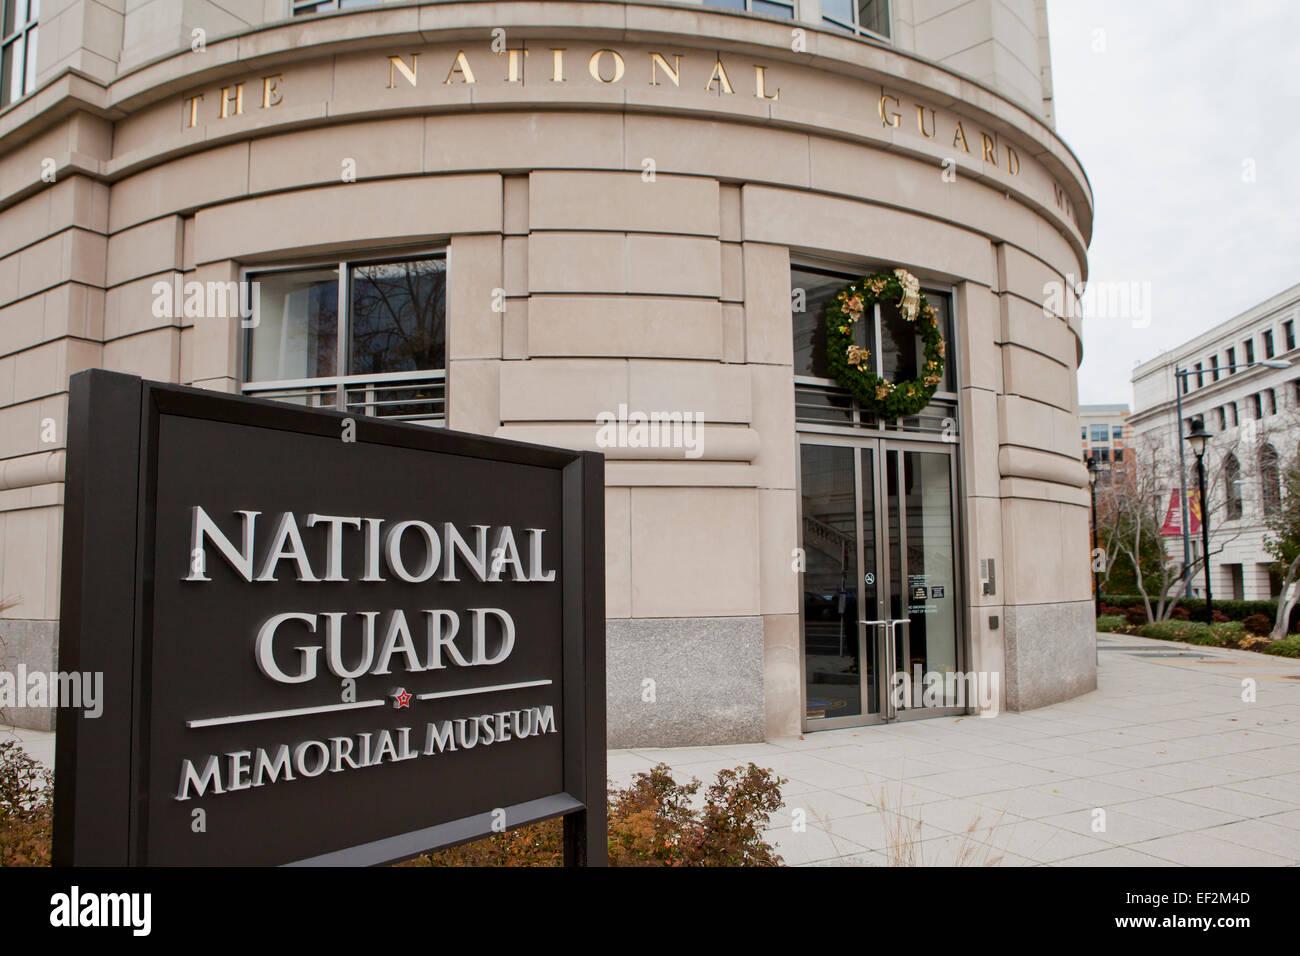 National Guard Memorial - Washington, DC USA Stock Photo